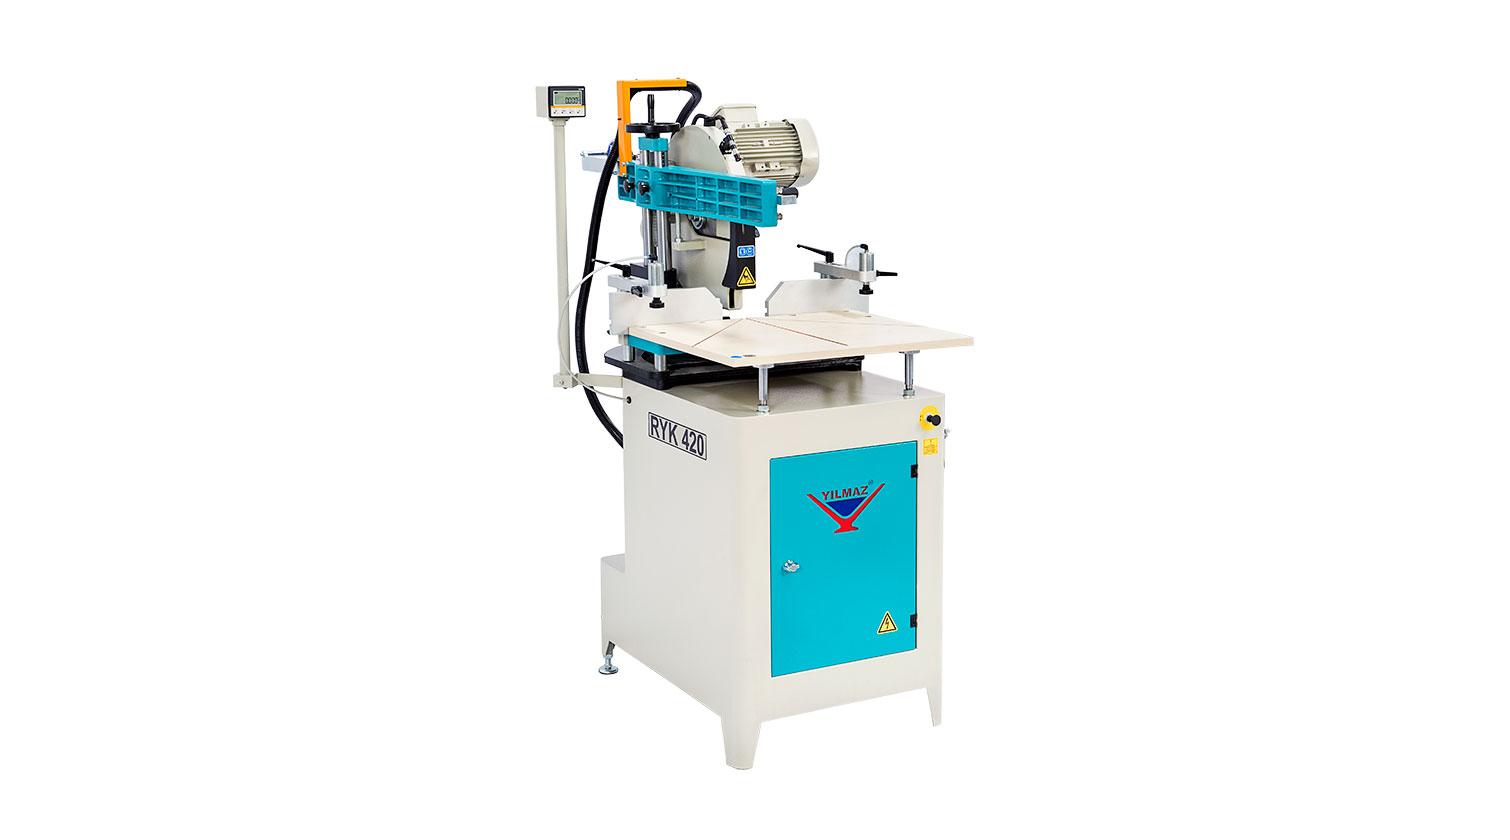 INT aluminum radial arm compound saw Yilmaz RYK 420